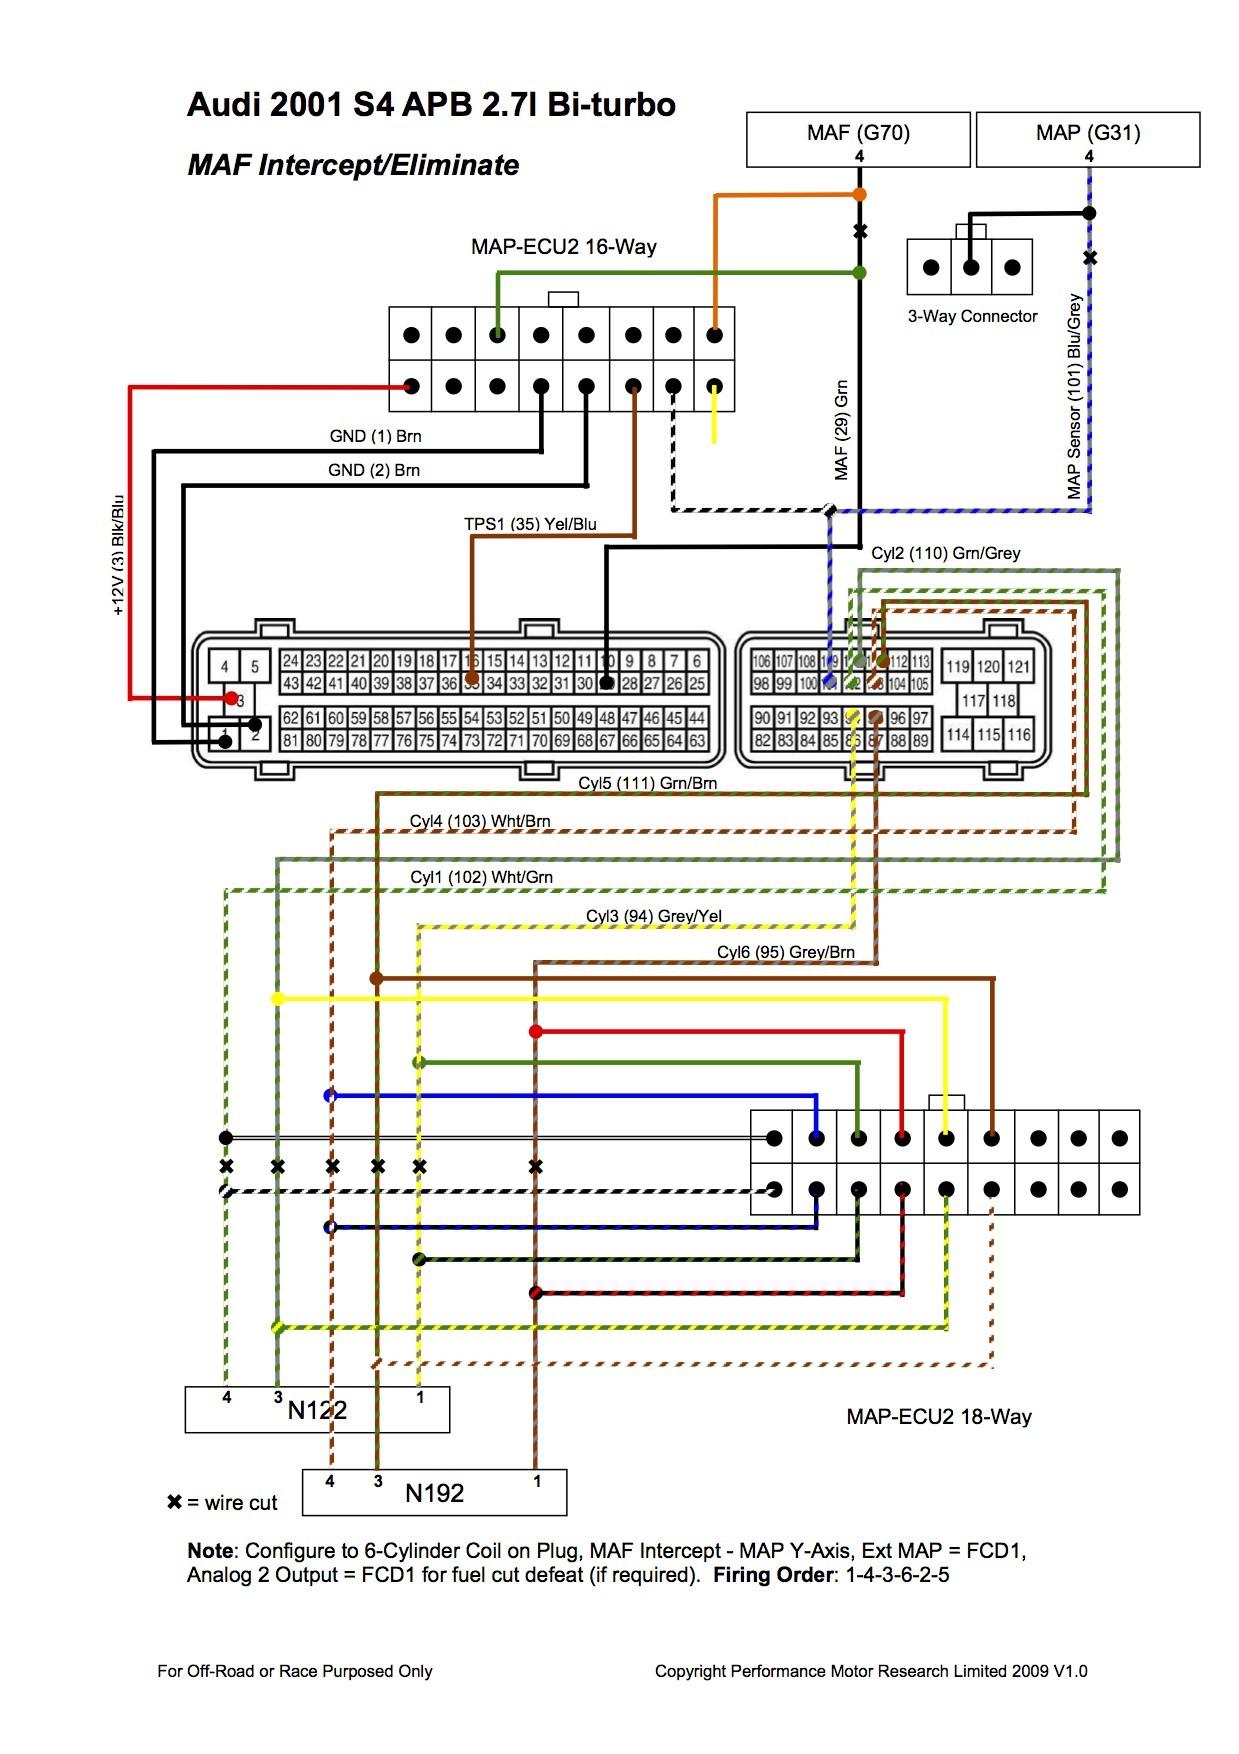 Jvc Car Stereo Wiring Diagram Elegant Jvc Kd R540 Wiring Diagram Wiring Diagrams